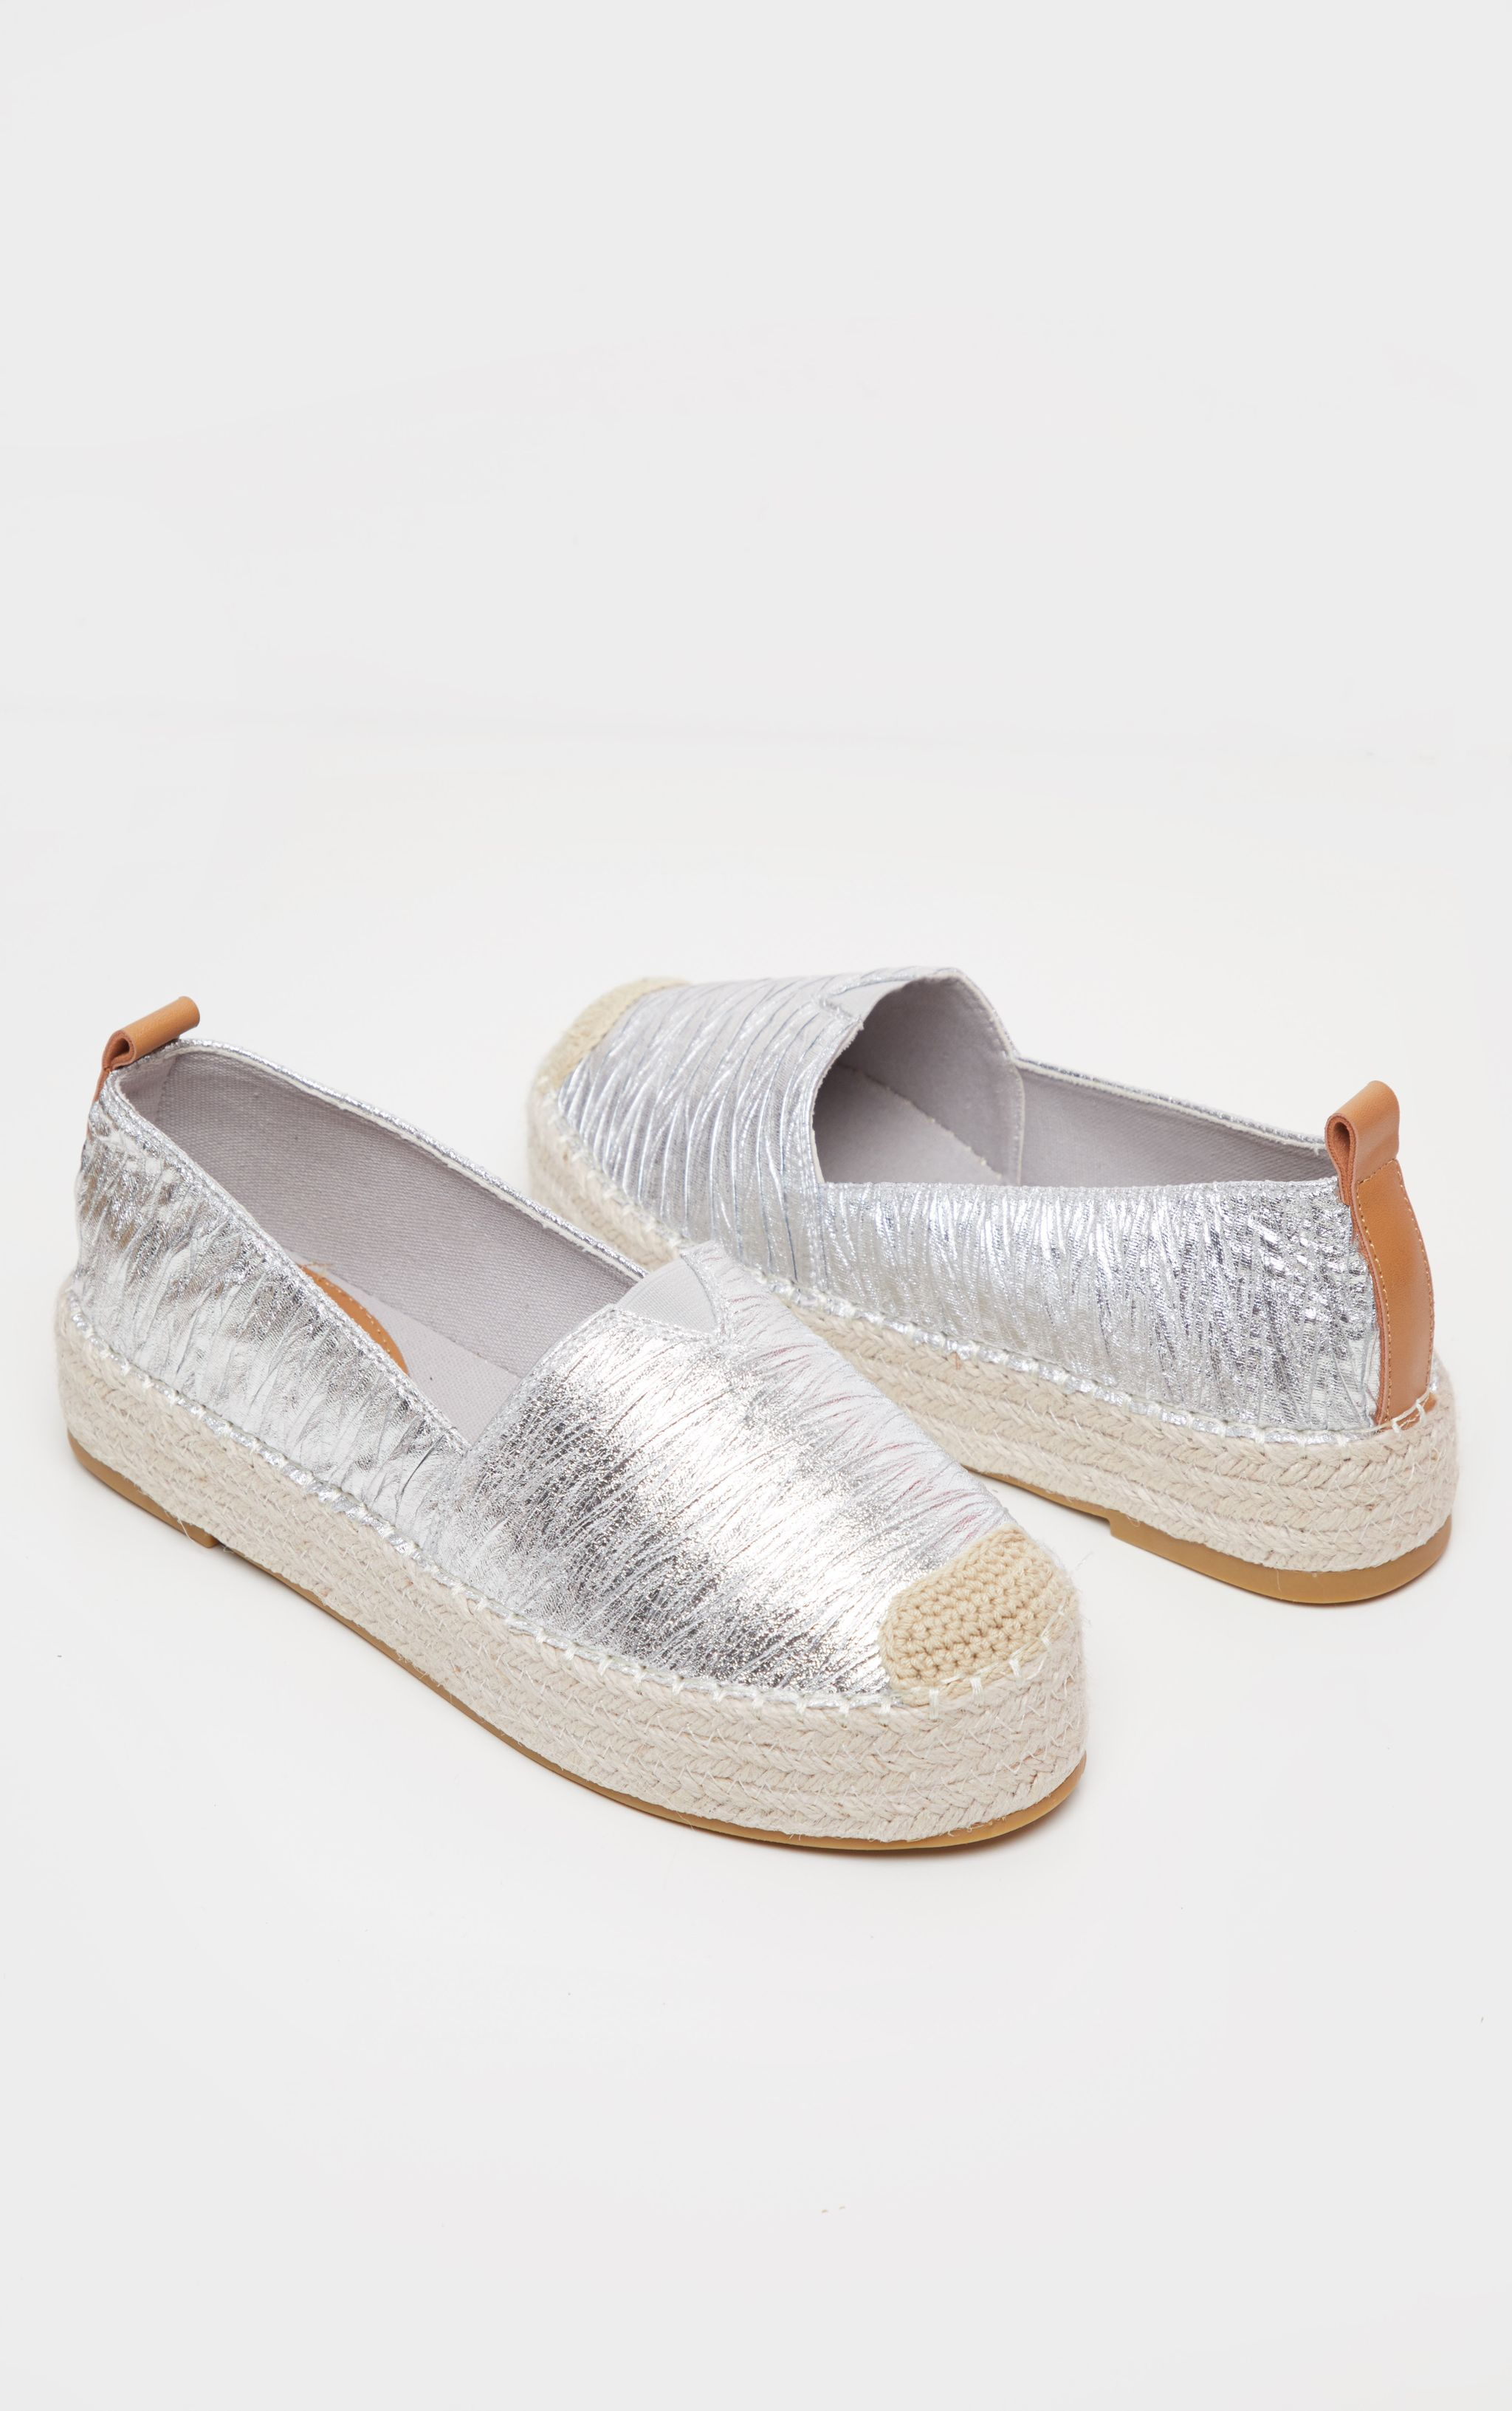 ec41a18ed Rose Gold Dome Studded Espadrille Flatform | Shoes | PrettyLittleThing USA